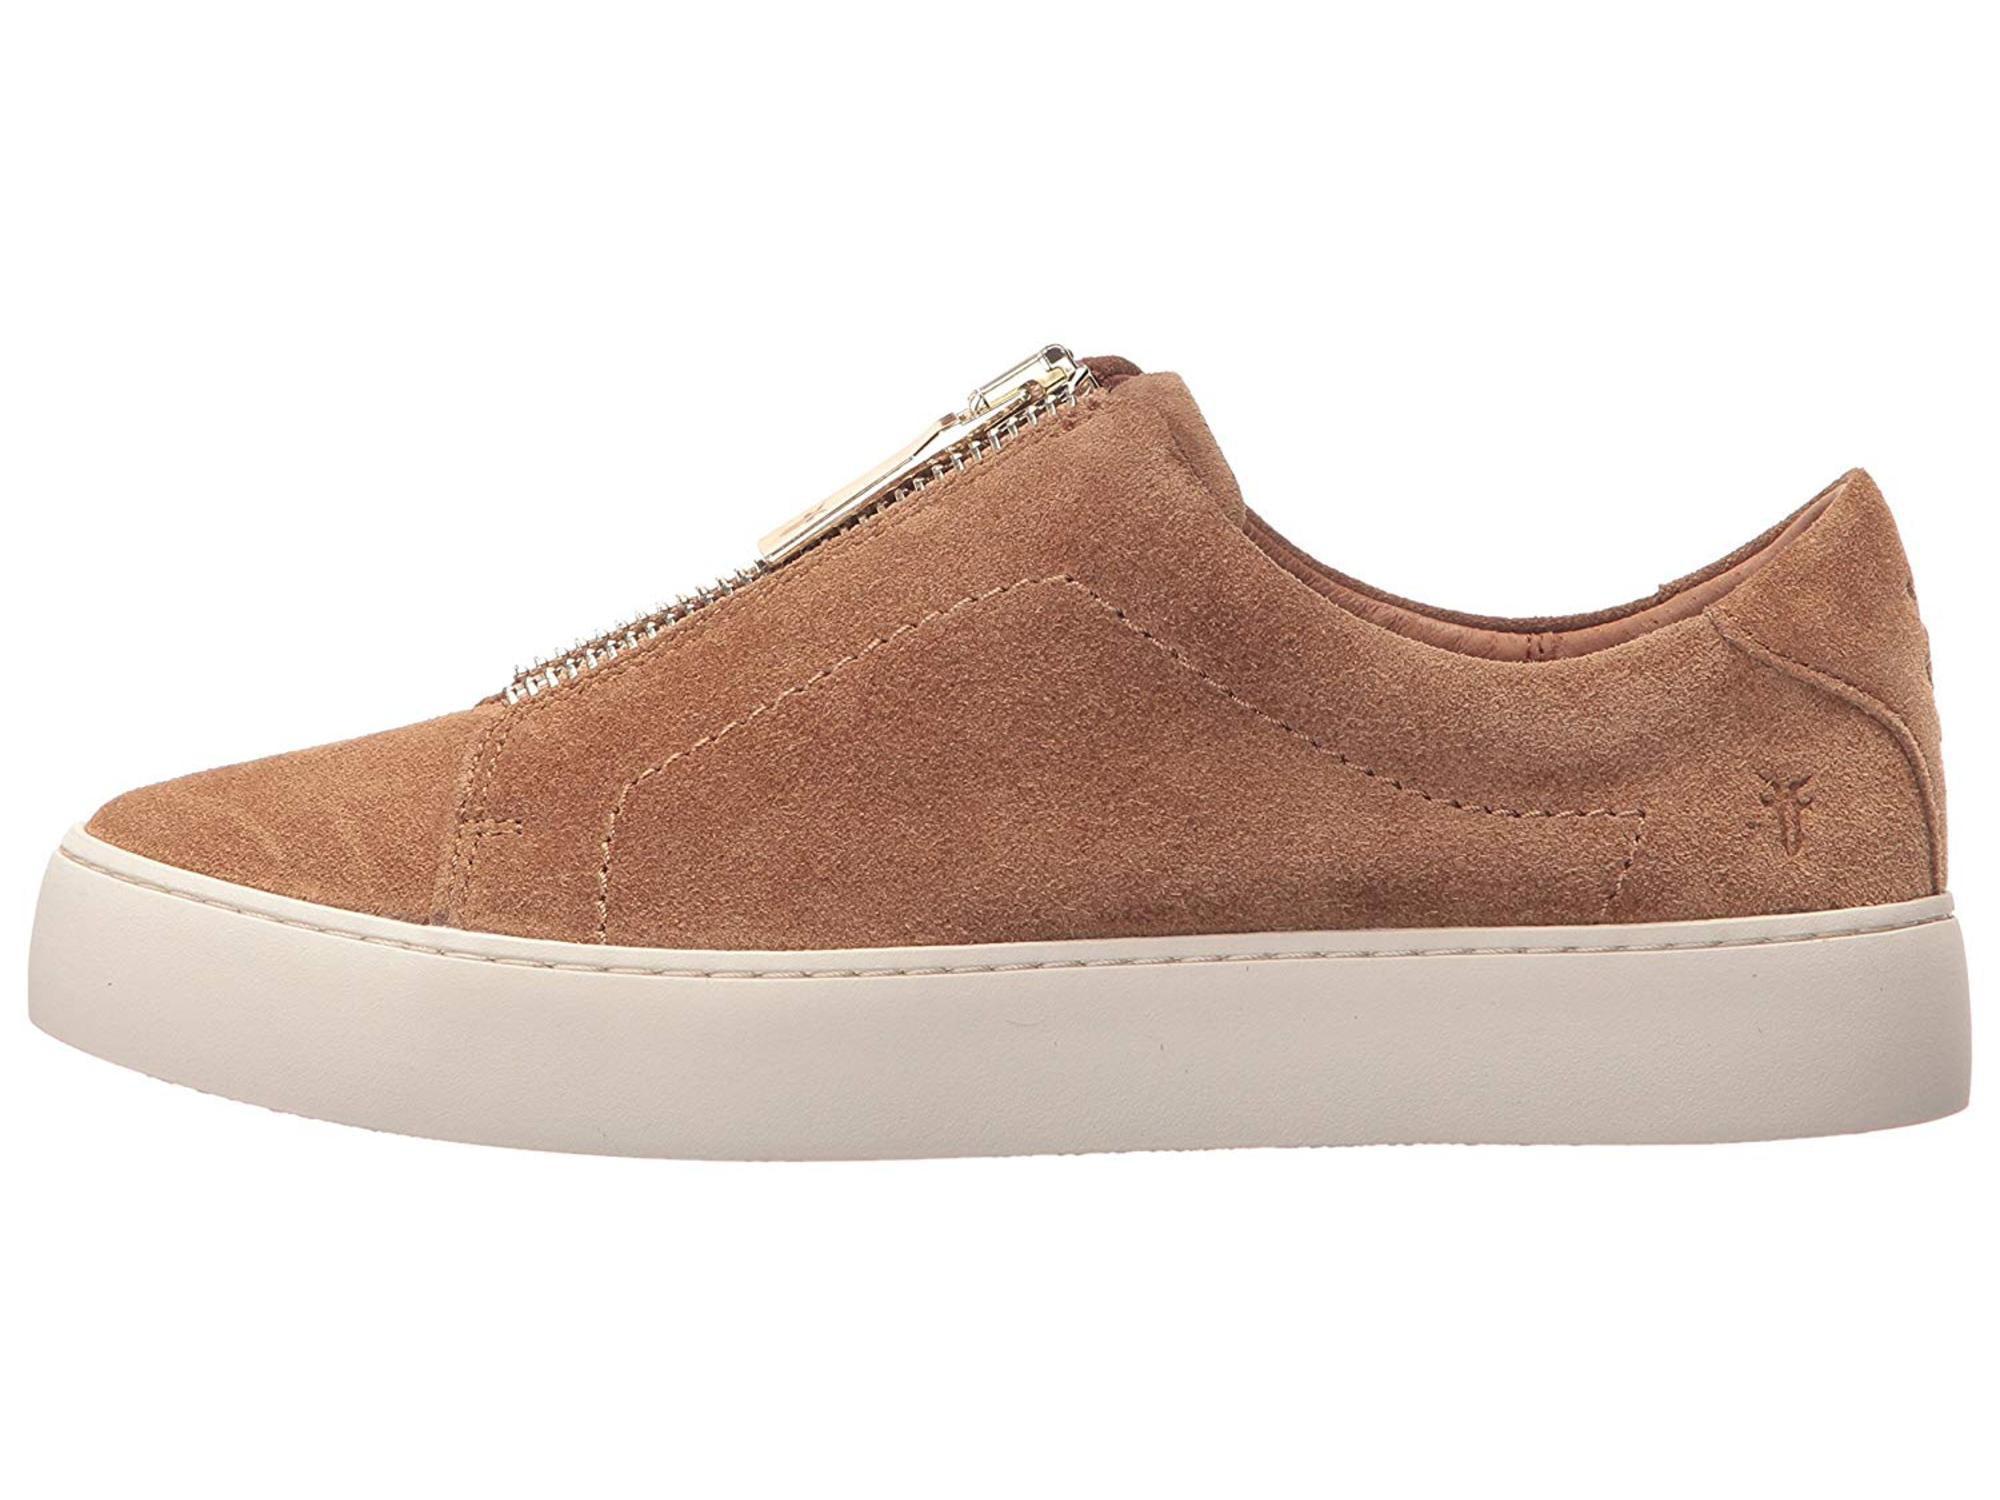 Frye Womens Lena Leather Low Top Slip